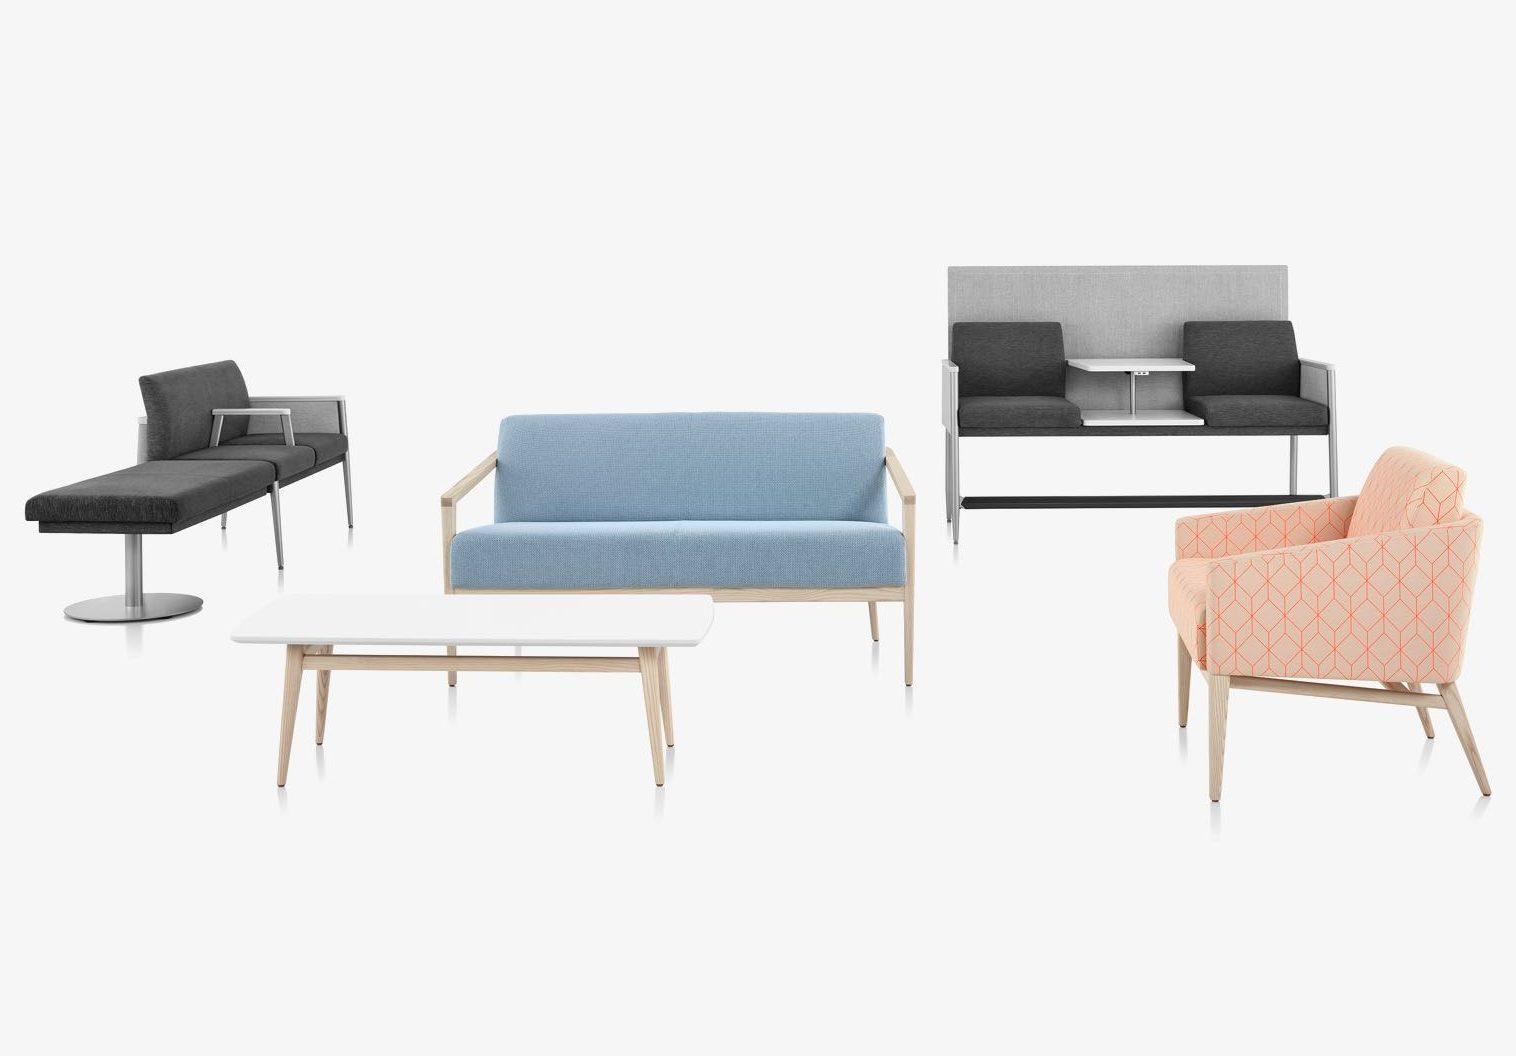 Public space healthcare furniture